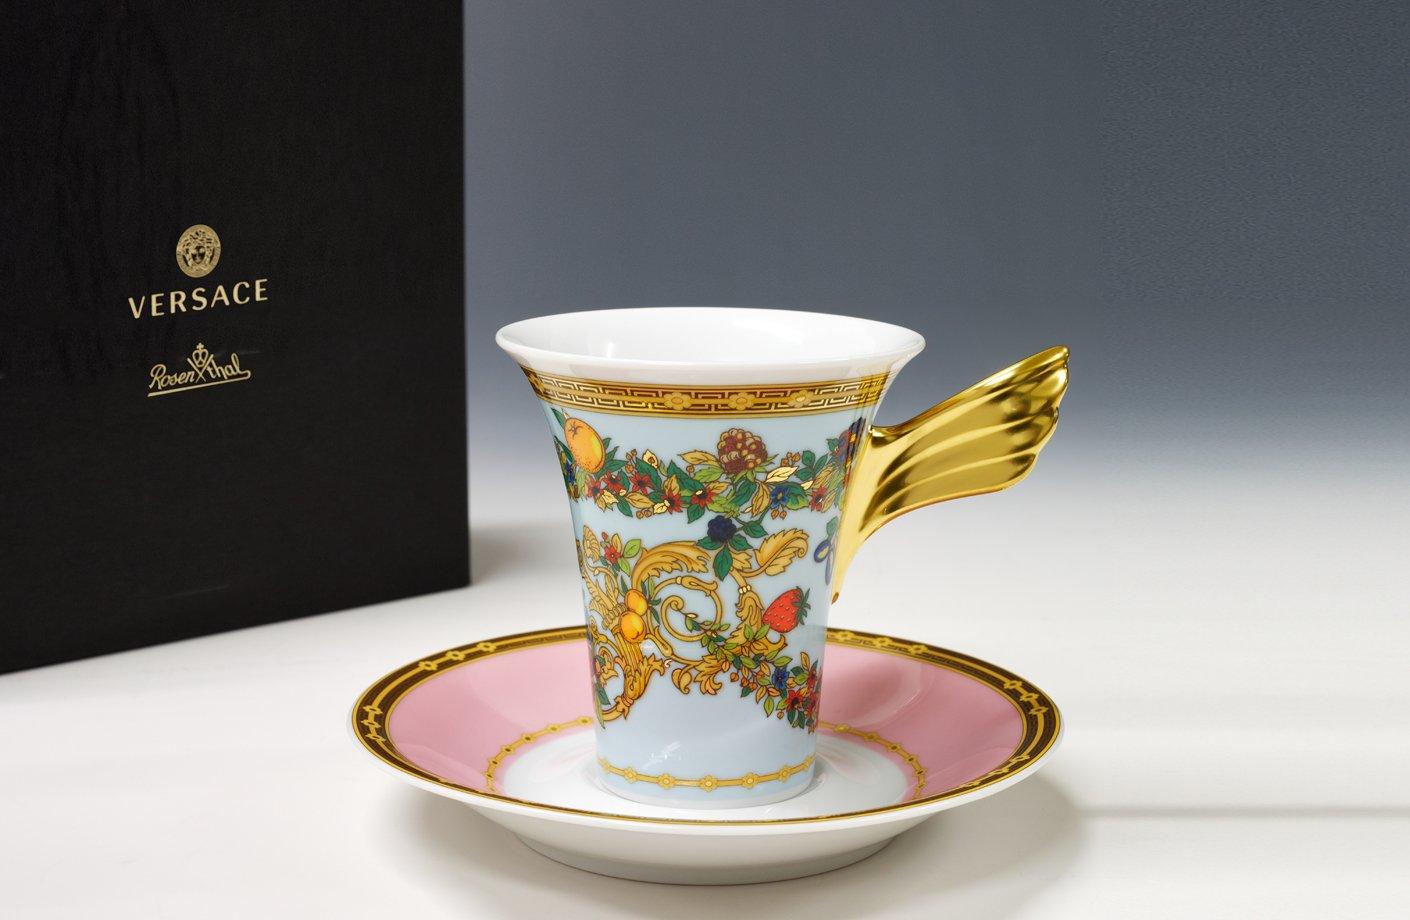 LE JARDIN DE VERSACE & LE JARDIN DE VERSACE COFFEE CUP \u0026 SAUCER | VERSACE HOME Australia